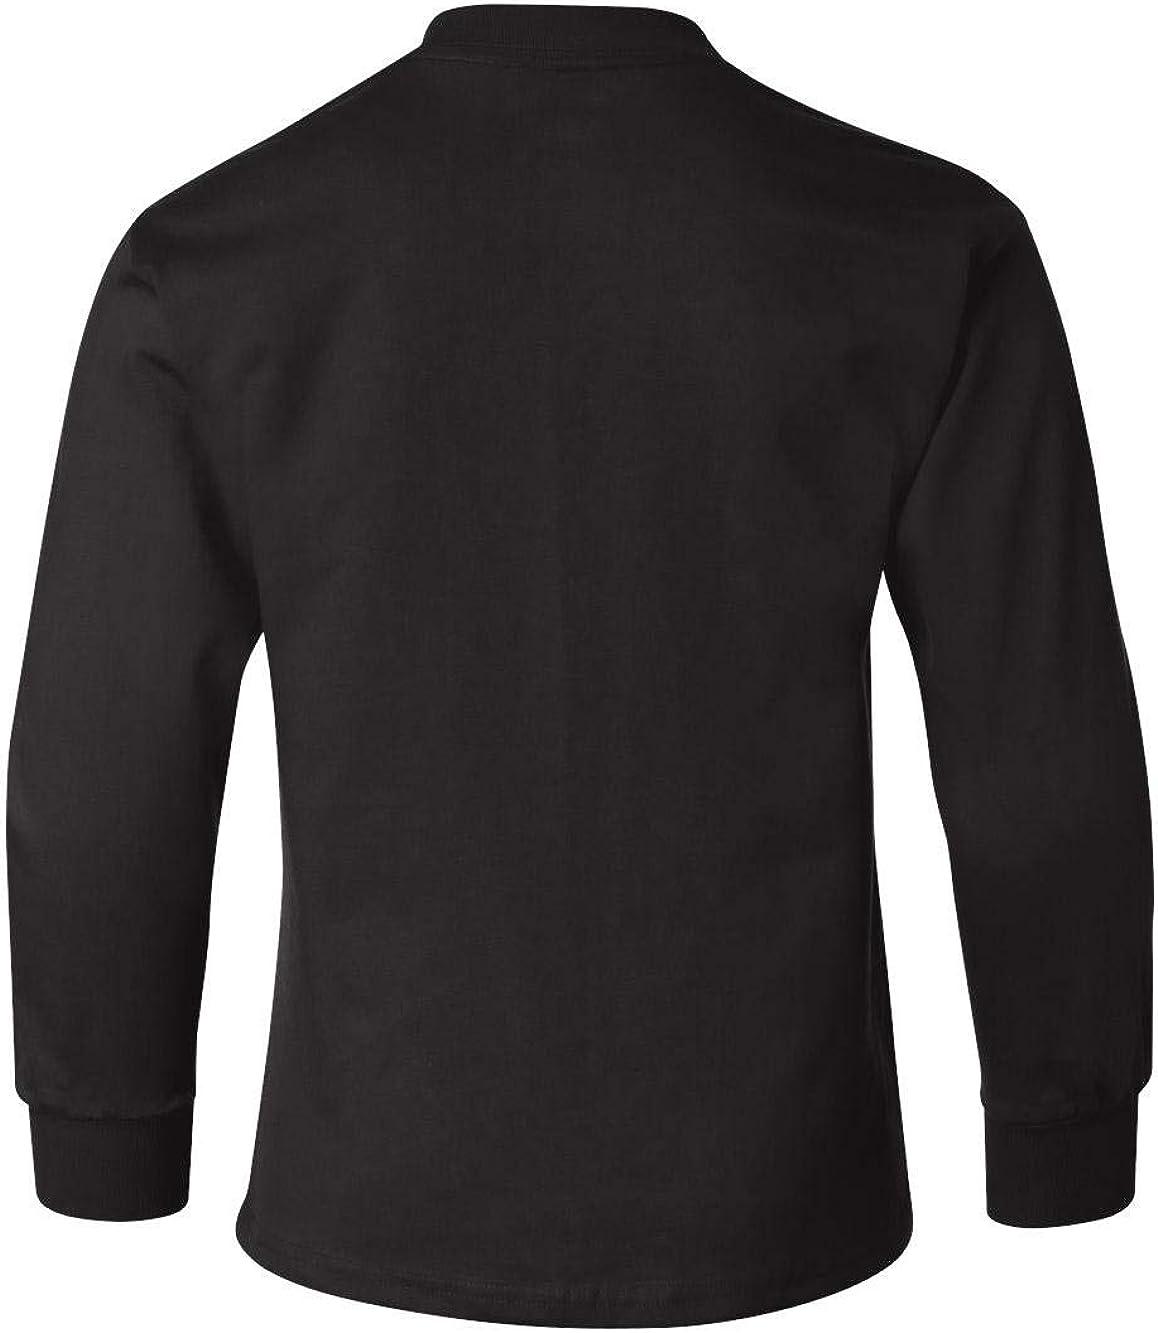 Hanes Youth 6.1 oz. Tagless ComfortSoft Long-Sleeve T-Shirt